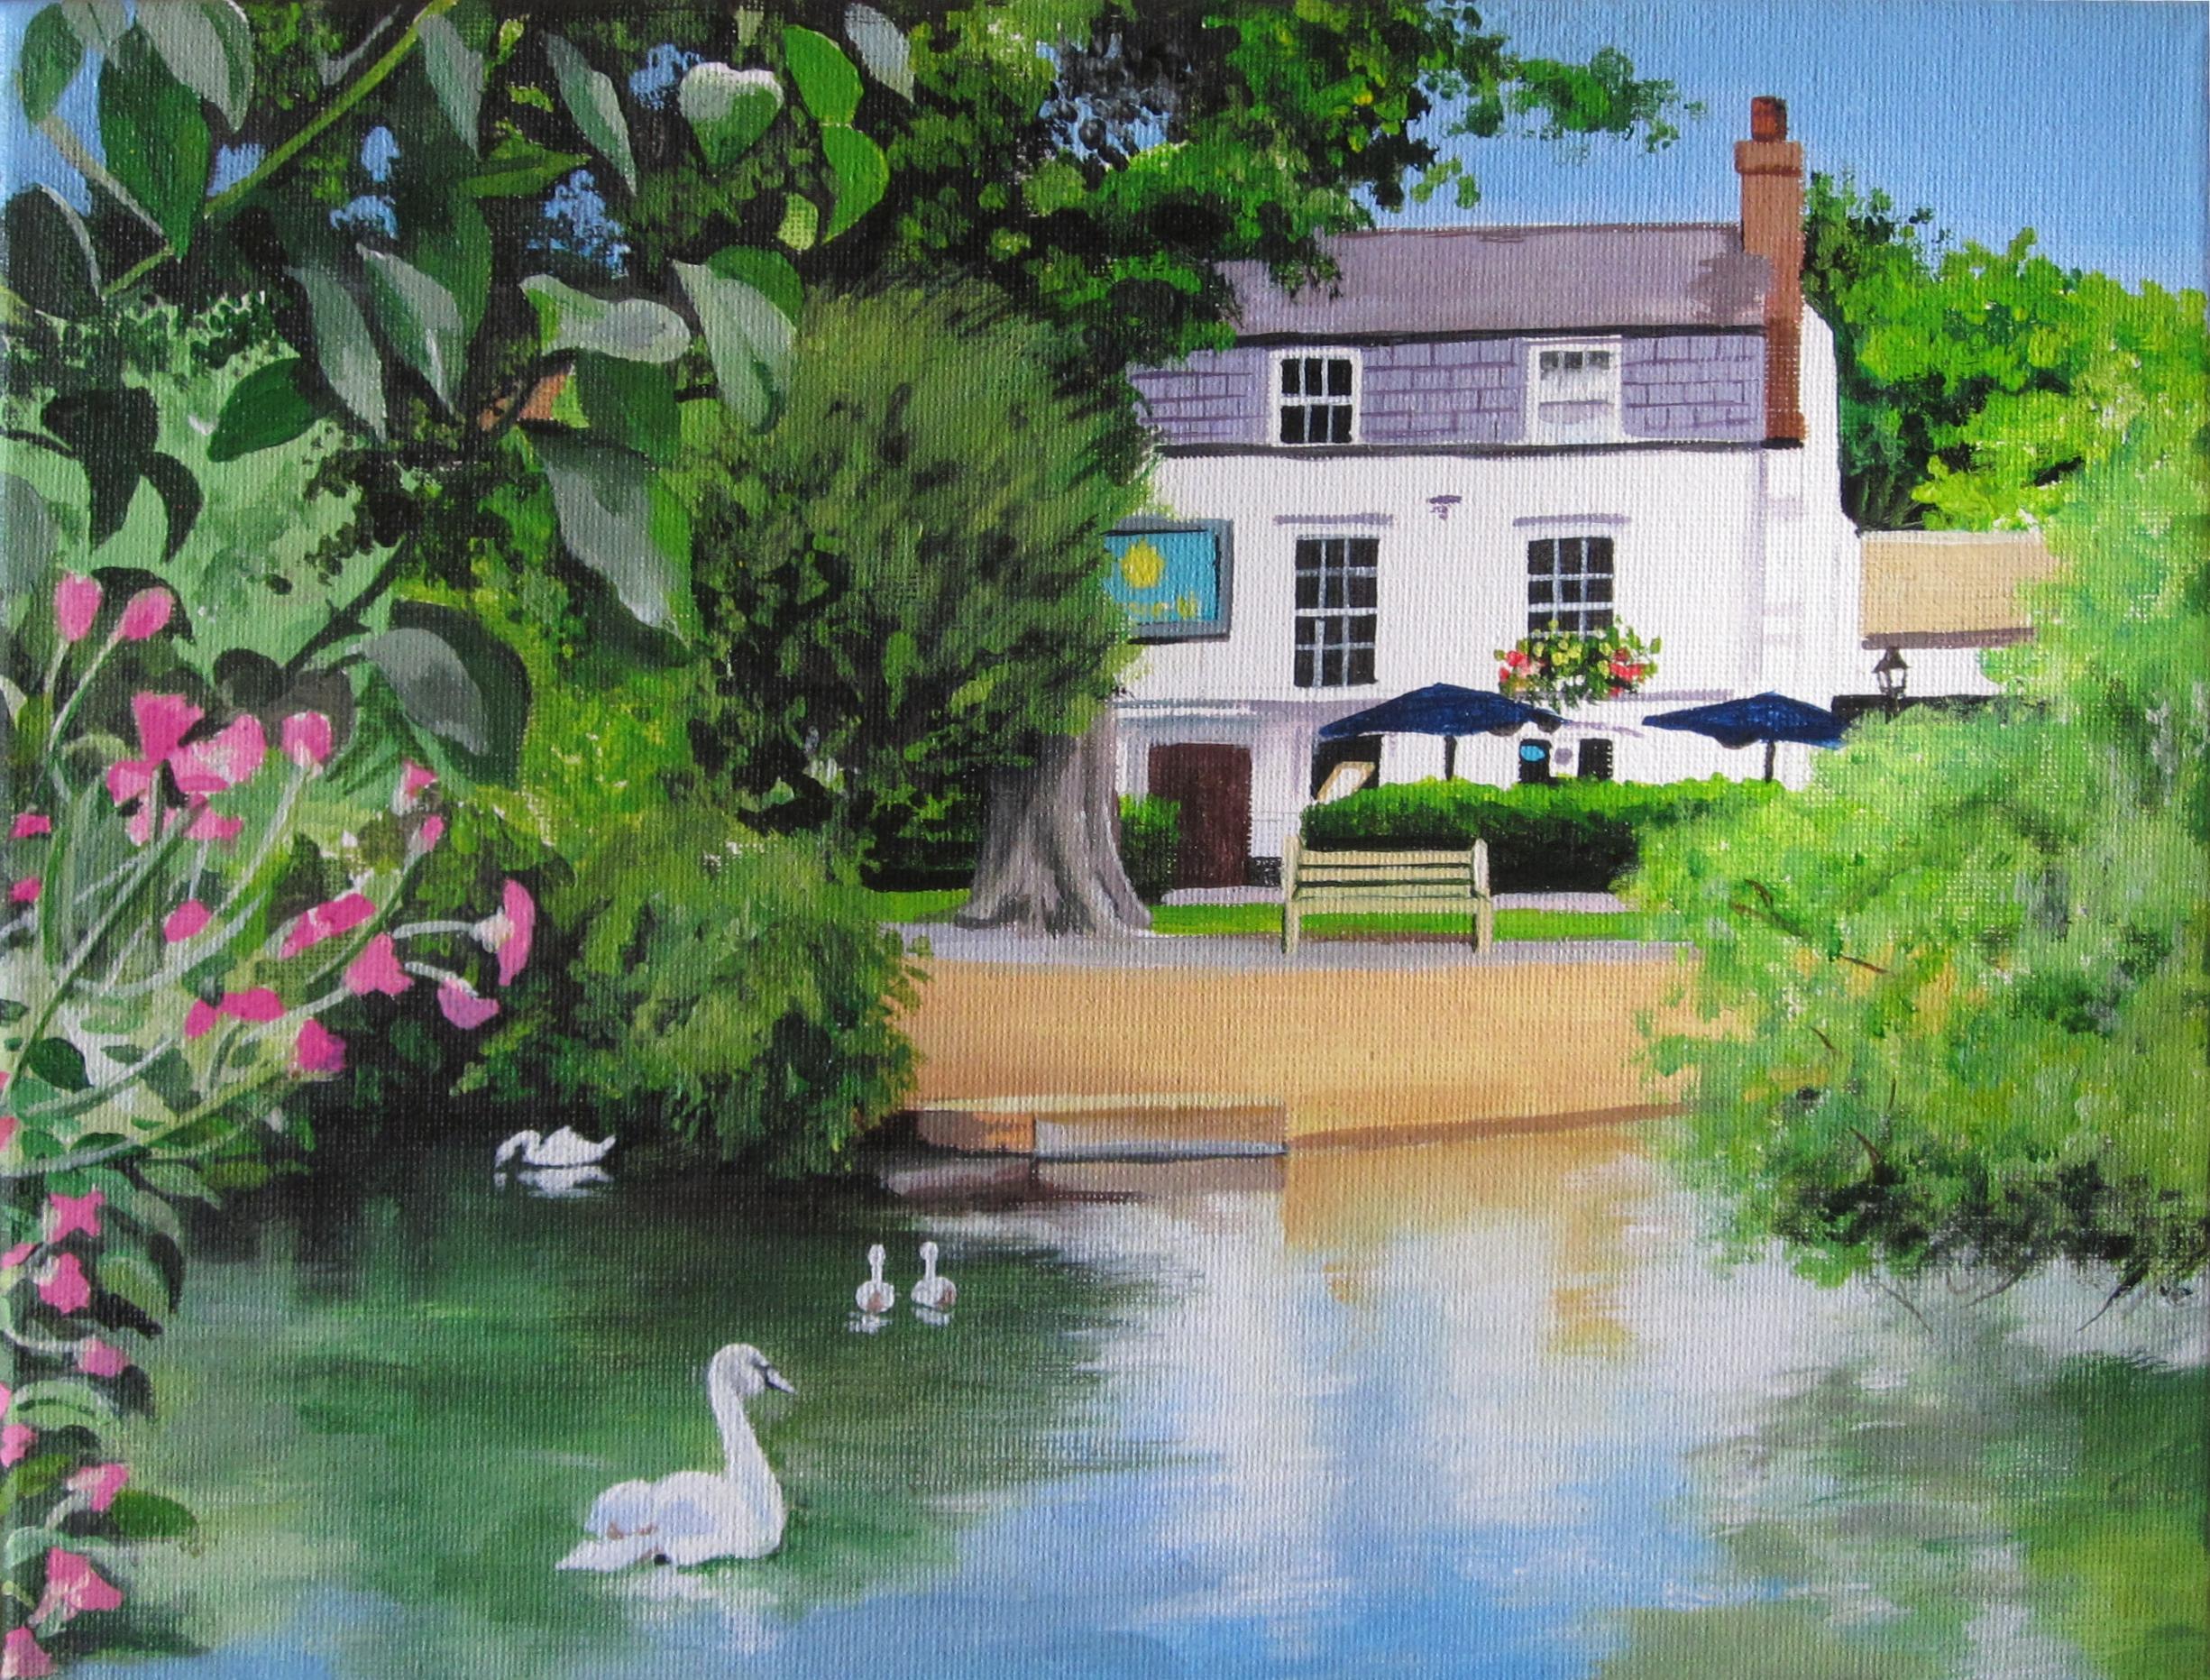 Barnes Pond